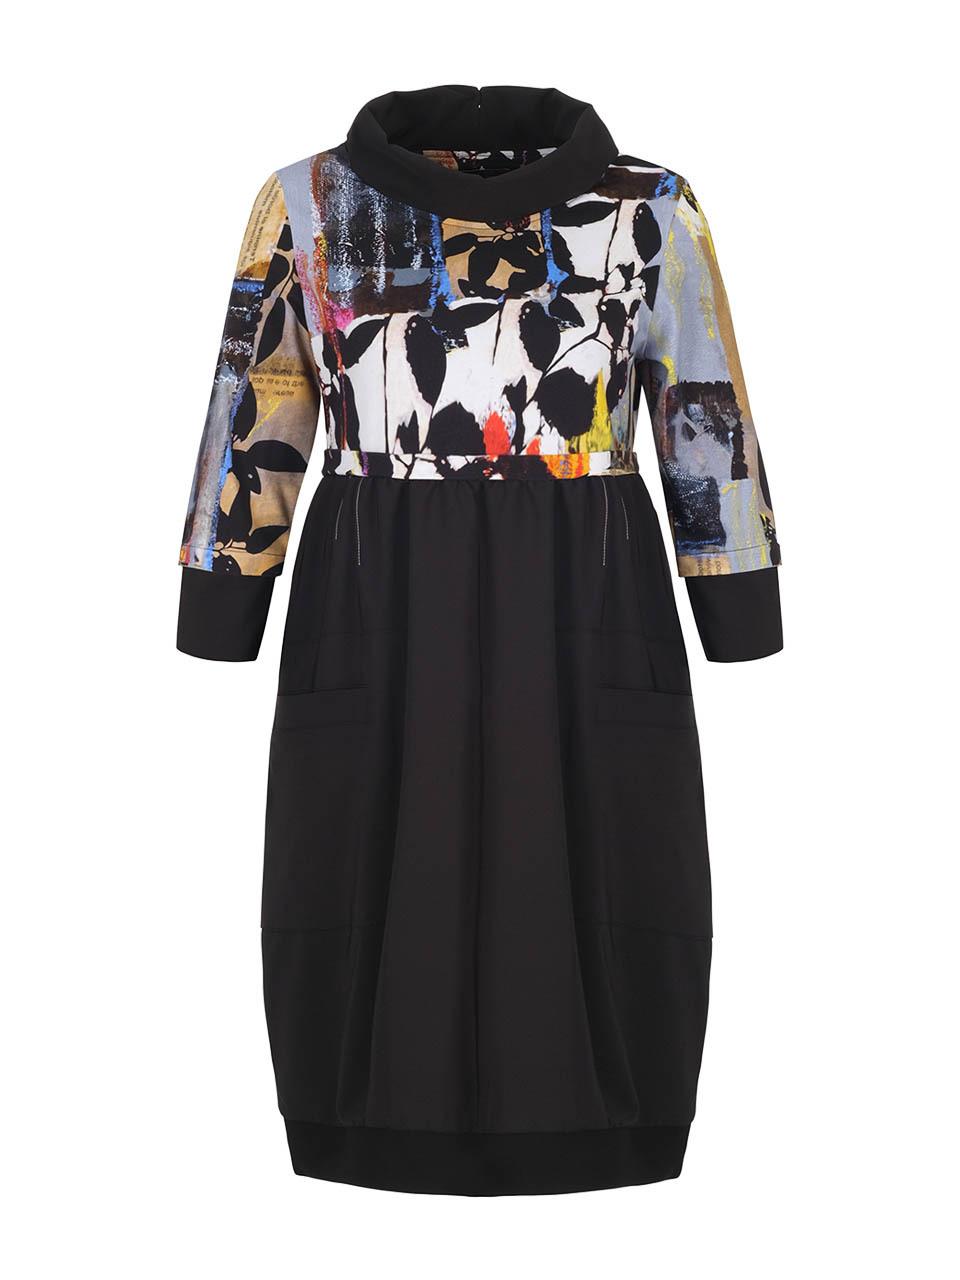 Simply Art Dolcezza: Mixed Media Double OO Abstract Art Midi Dress (3 Left!) Dolcezza_SimplyArt_71699